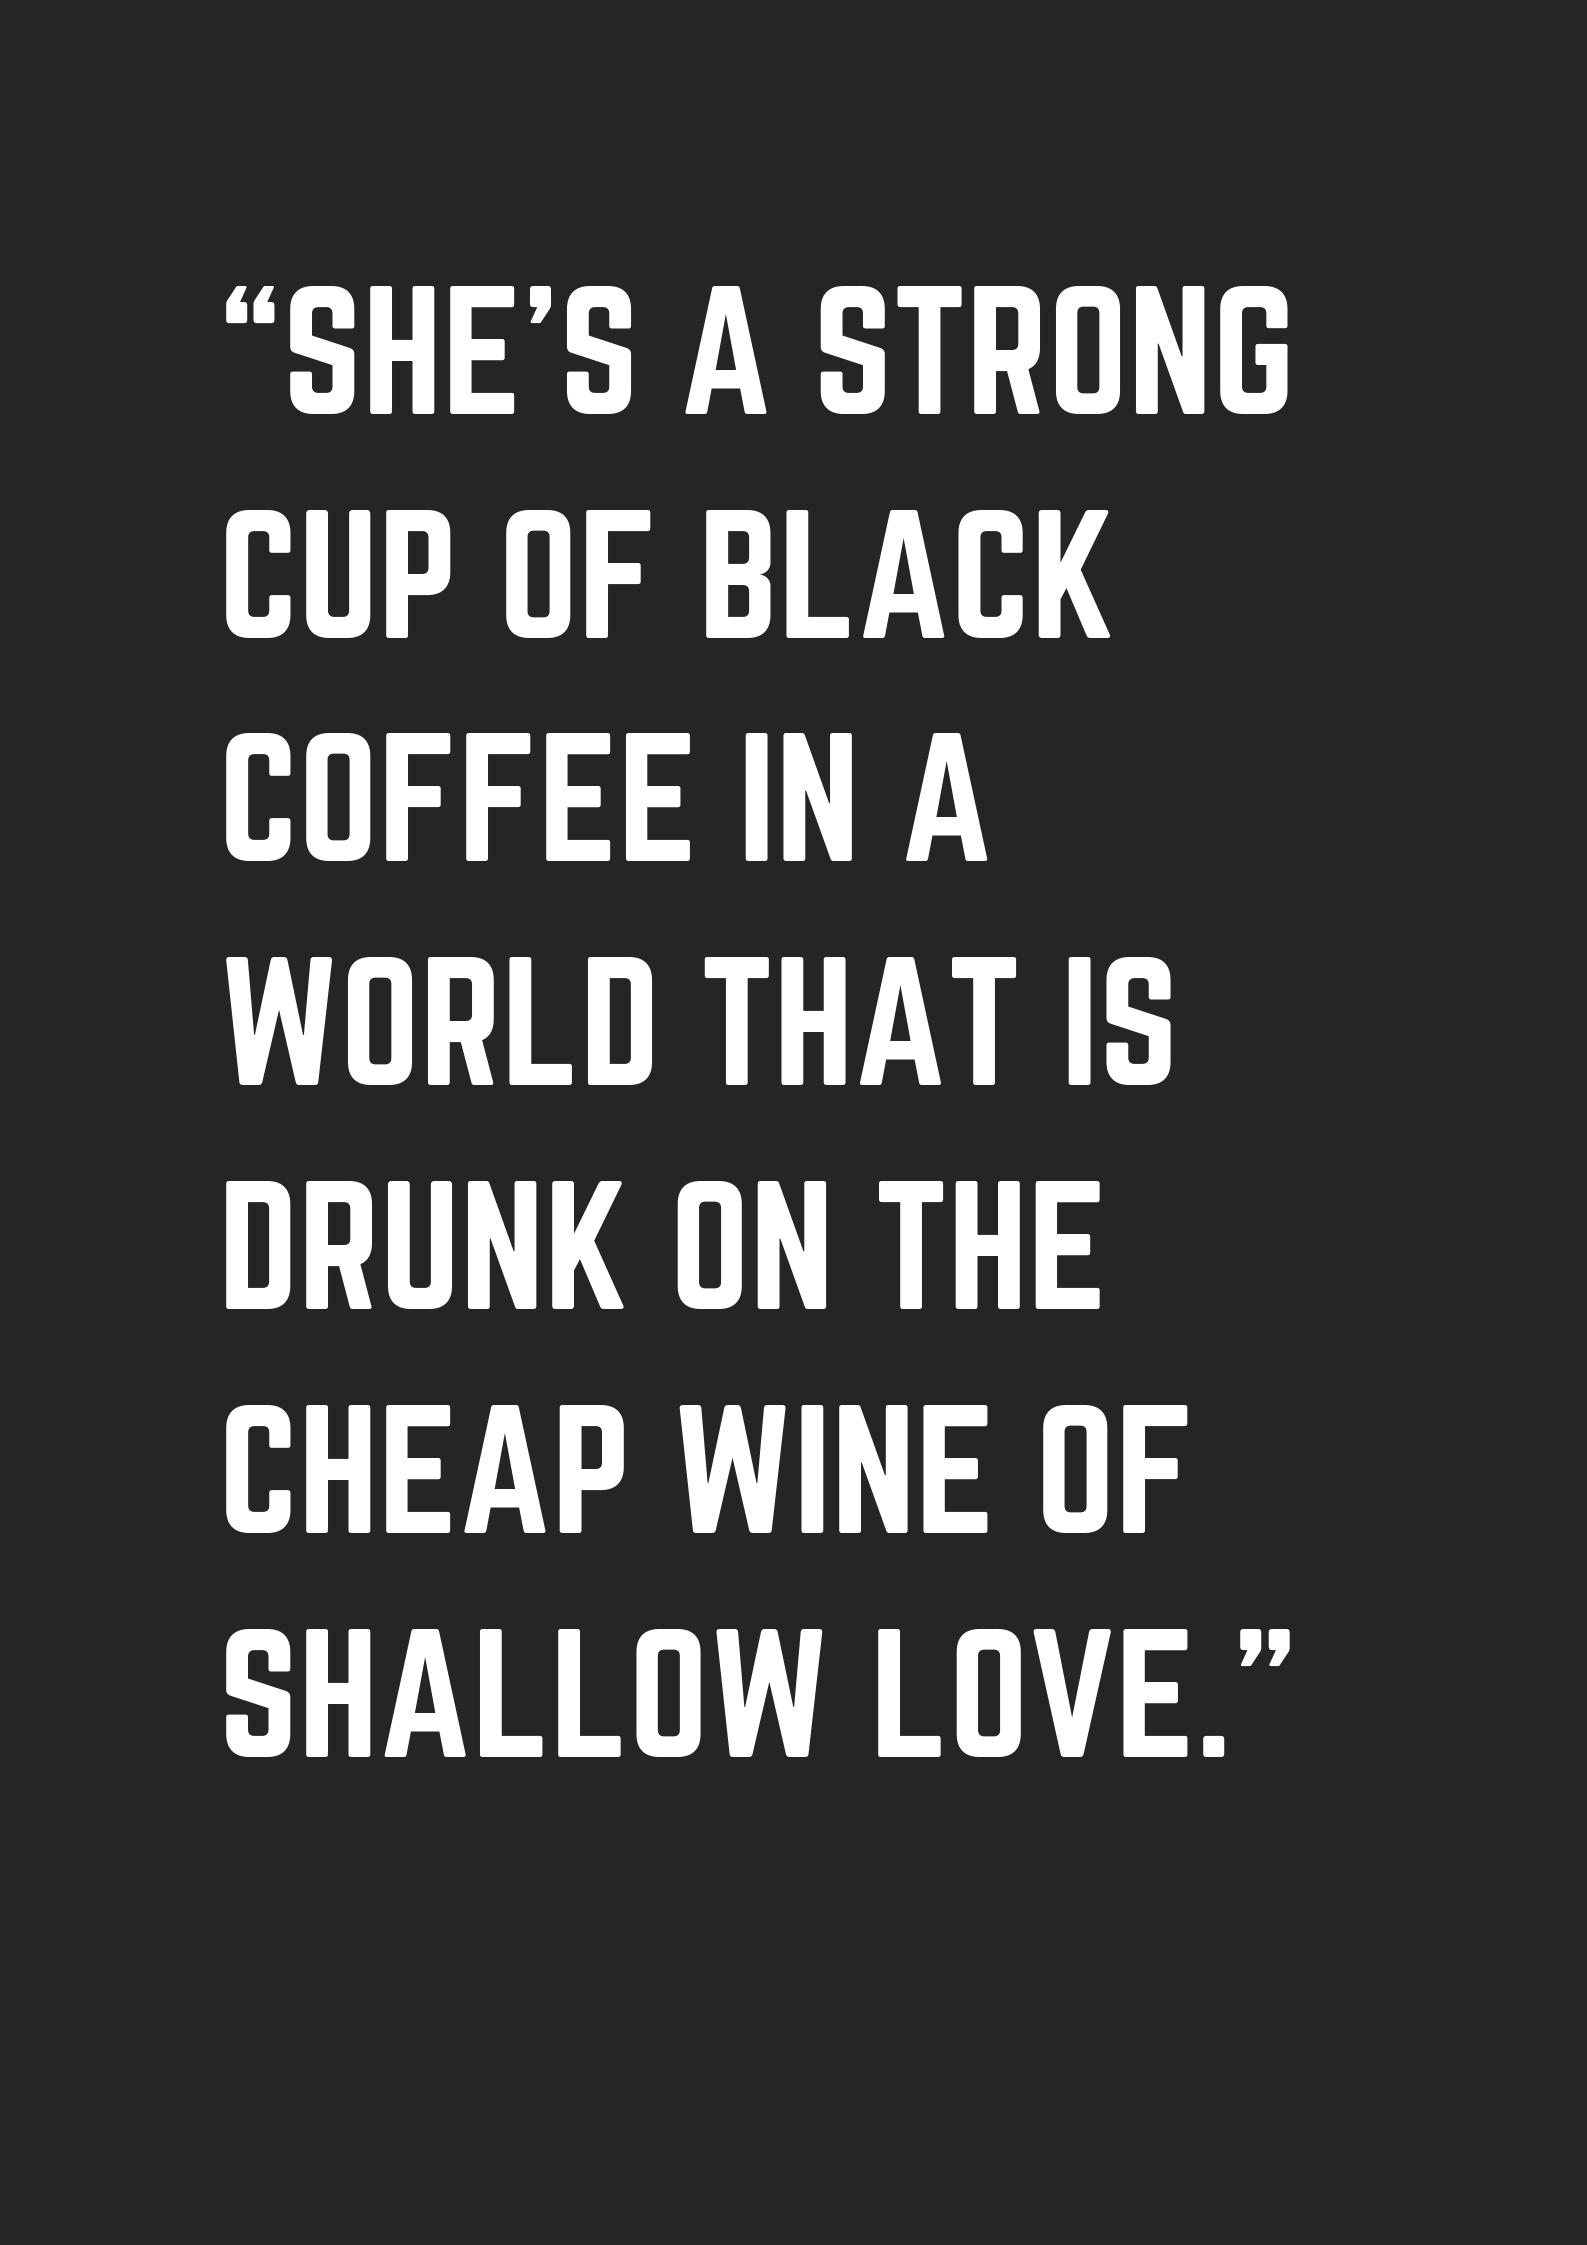 Funny Strong Women Quotes : funny, strong, women, quotes, Strong, Woman, Quotes, Museuly, Women, Quotes,, Funny